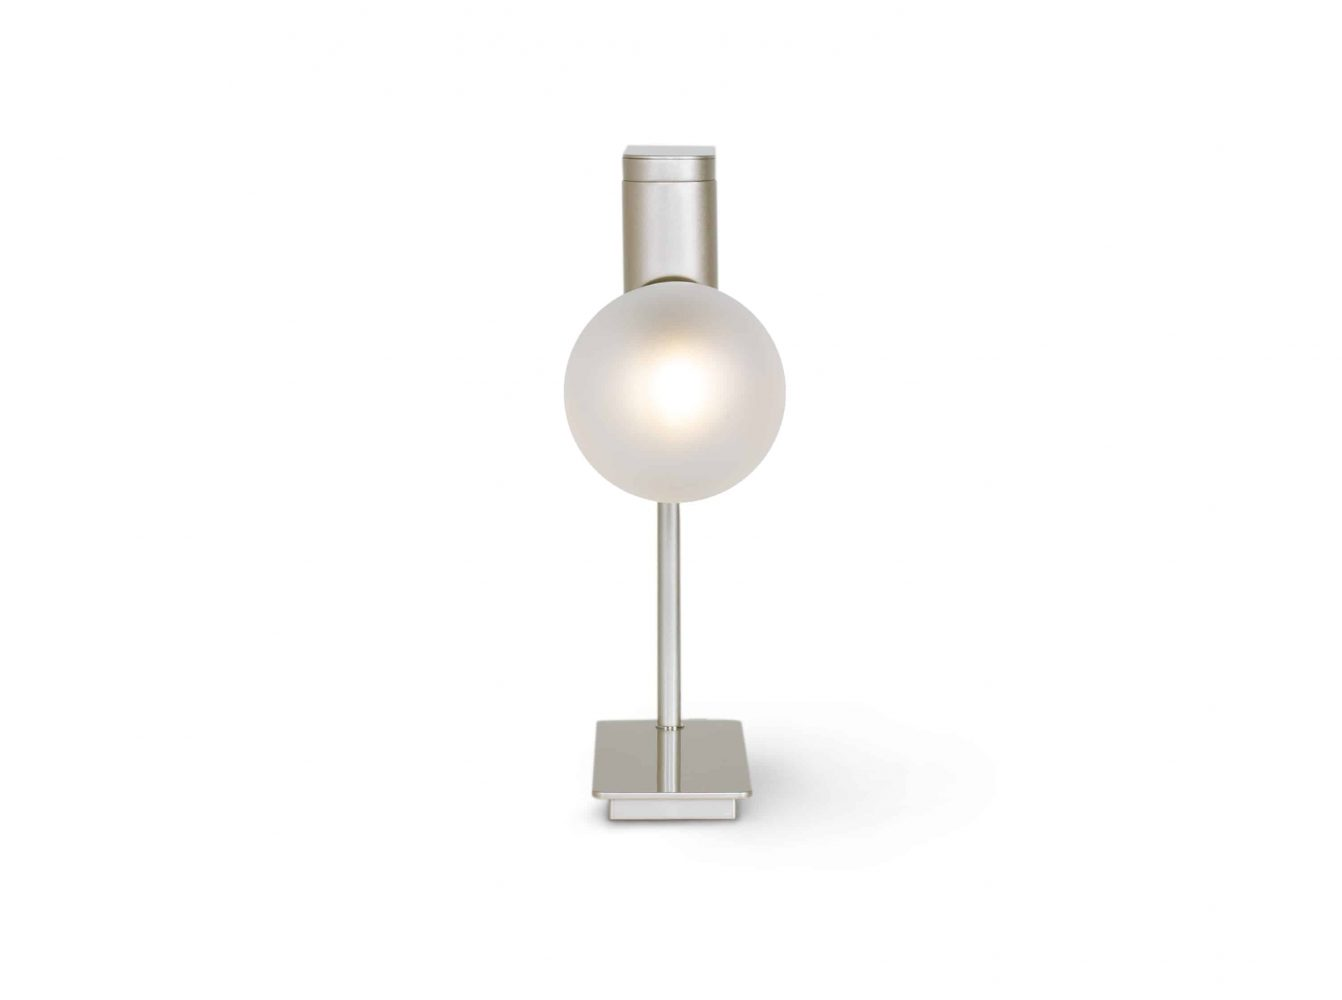 Greenapple Bobo Lighting